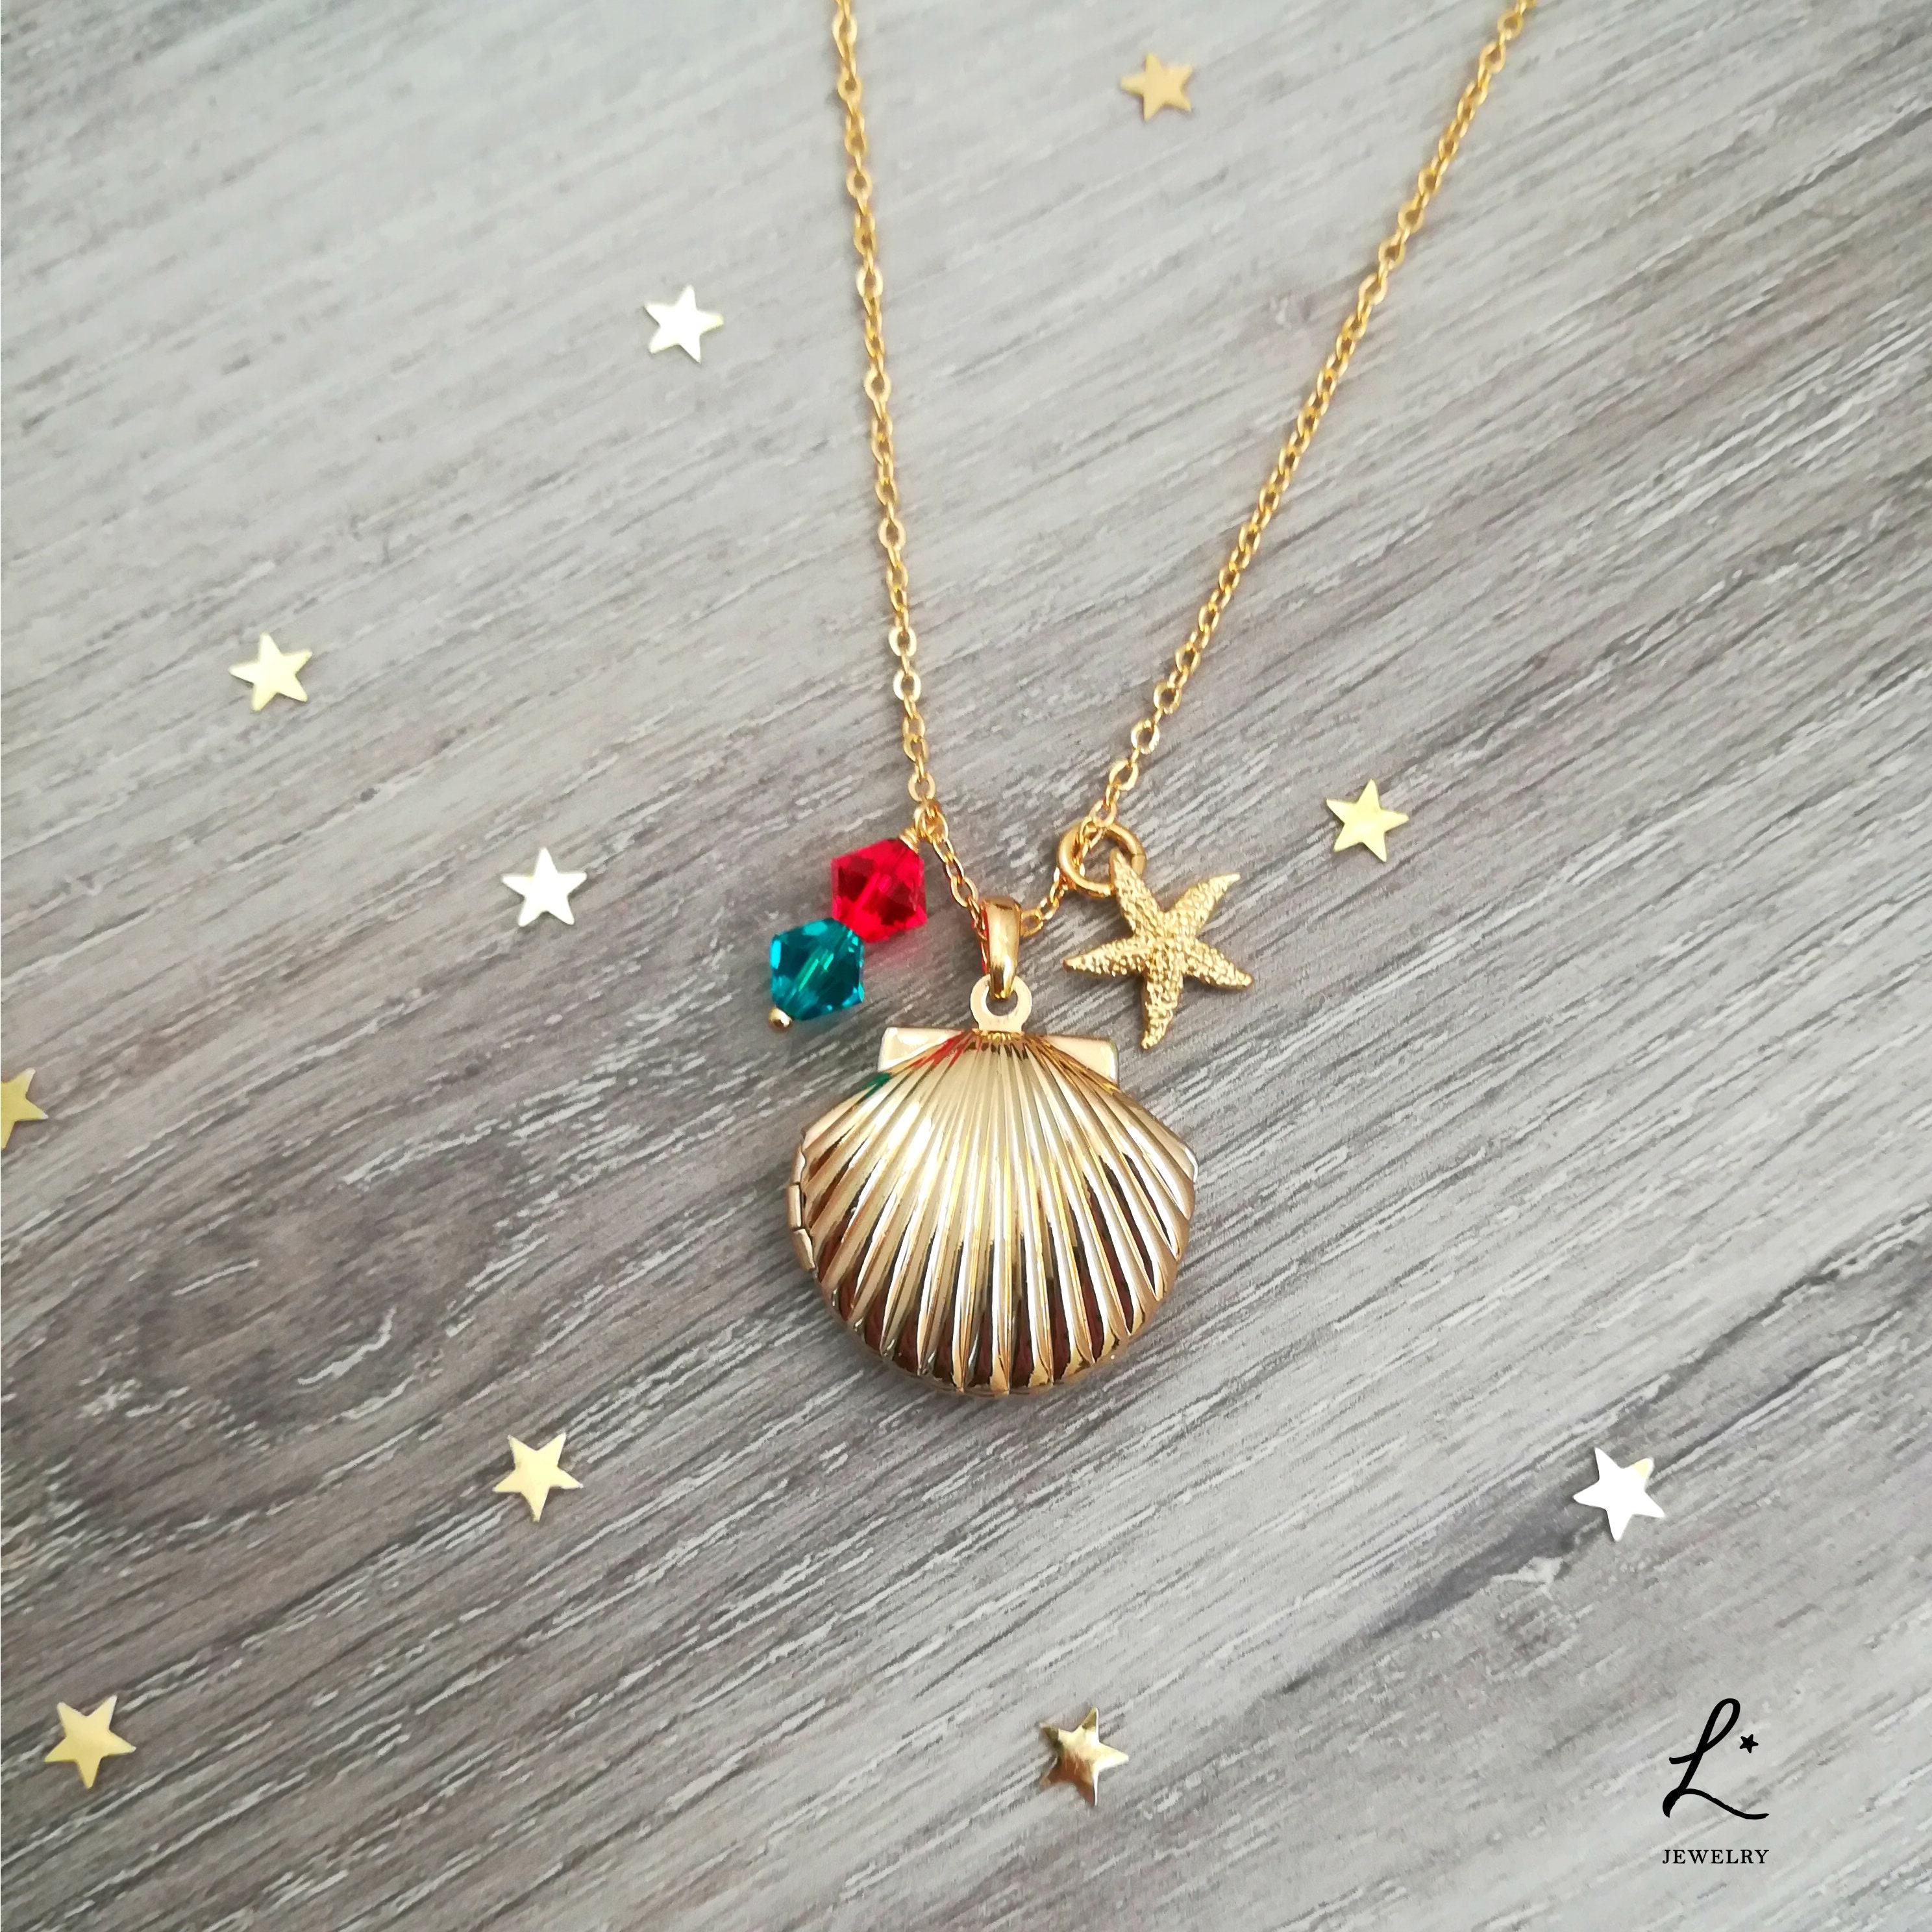 Make Your Own Seashell Jewelry: Little Mermaid Seashell Locket & Starfish Necklace